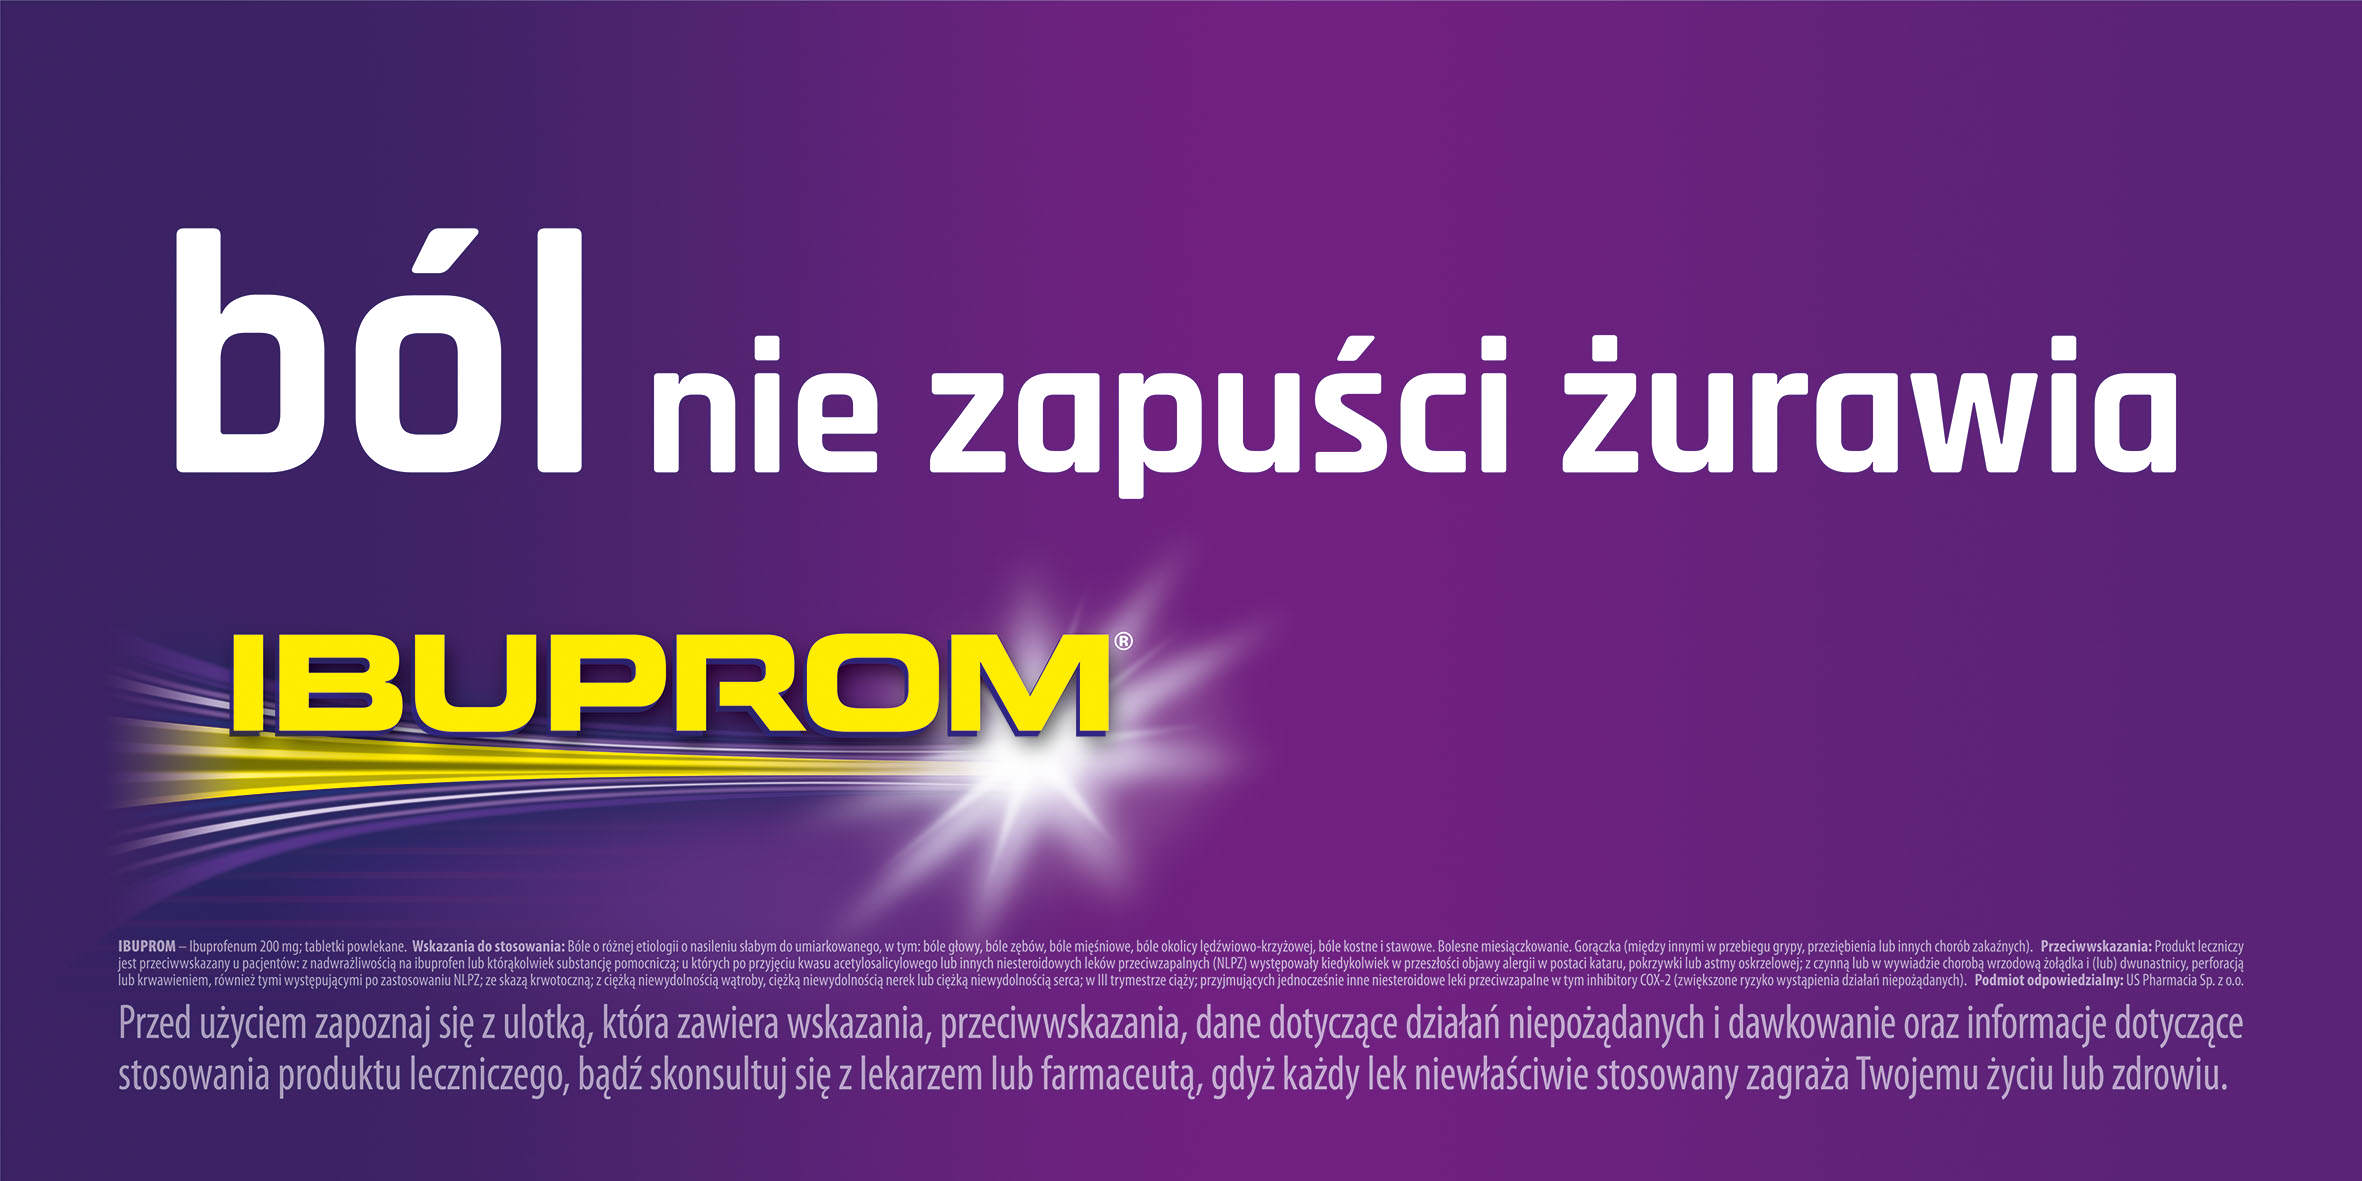 ibuprom2016_bill_6x3_so_bolniezapuscizurawia